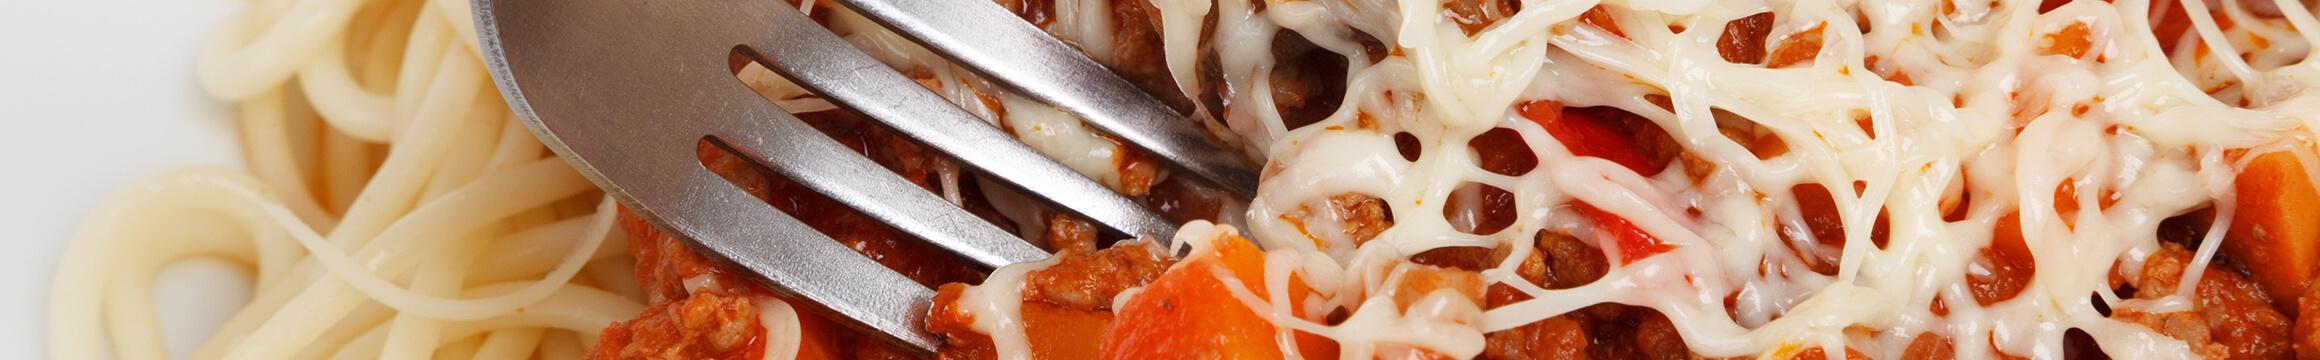 Food Culinary 02